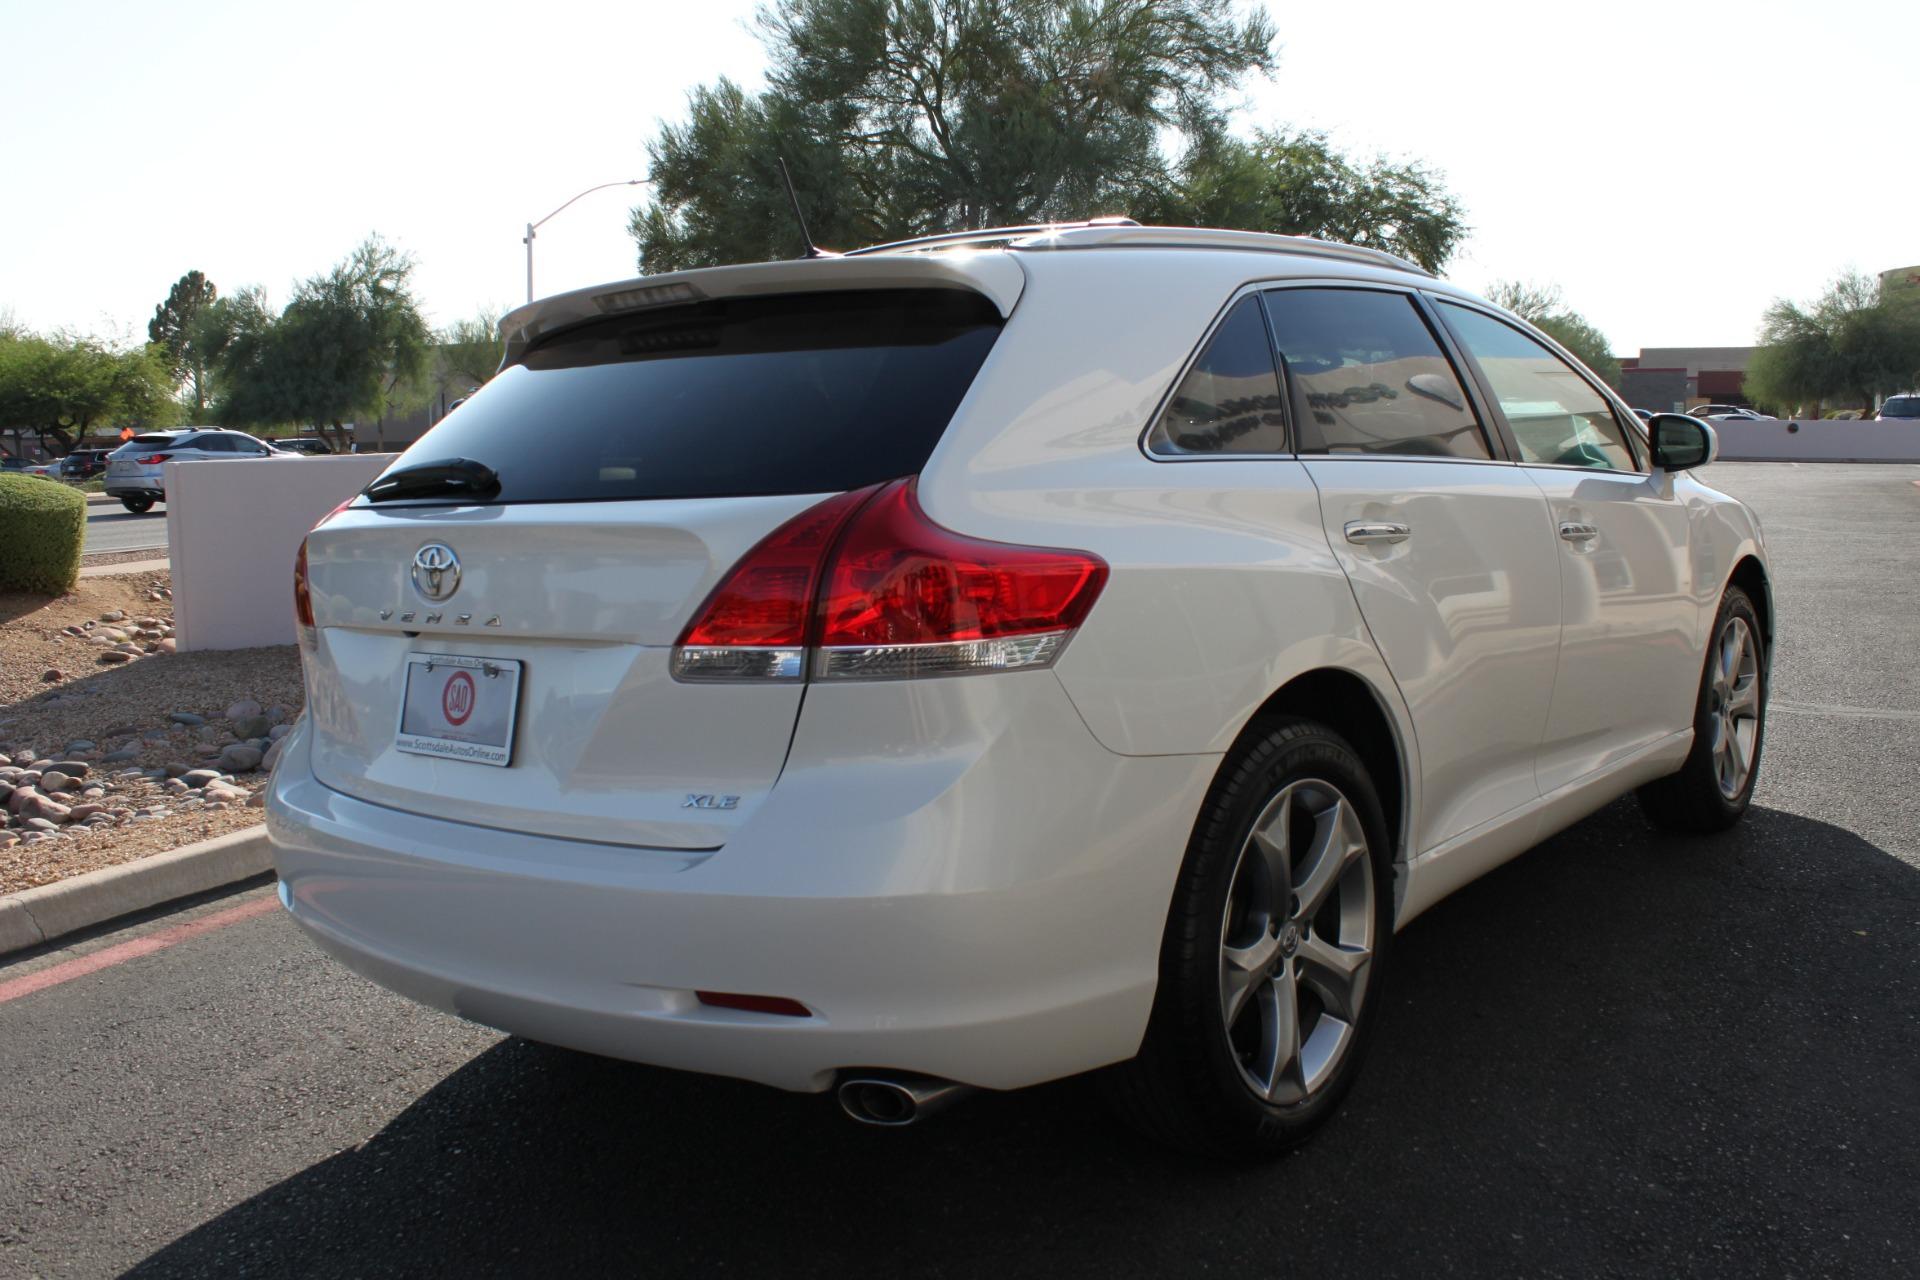 Used-2012-Toyota-Venza-XLE-Classic